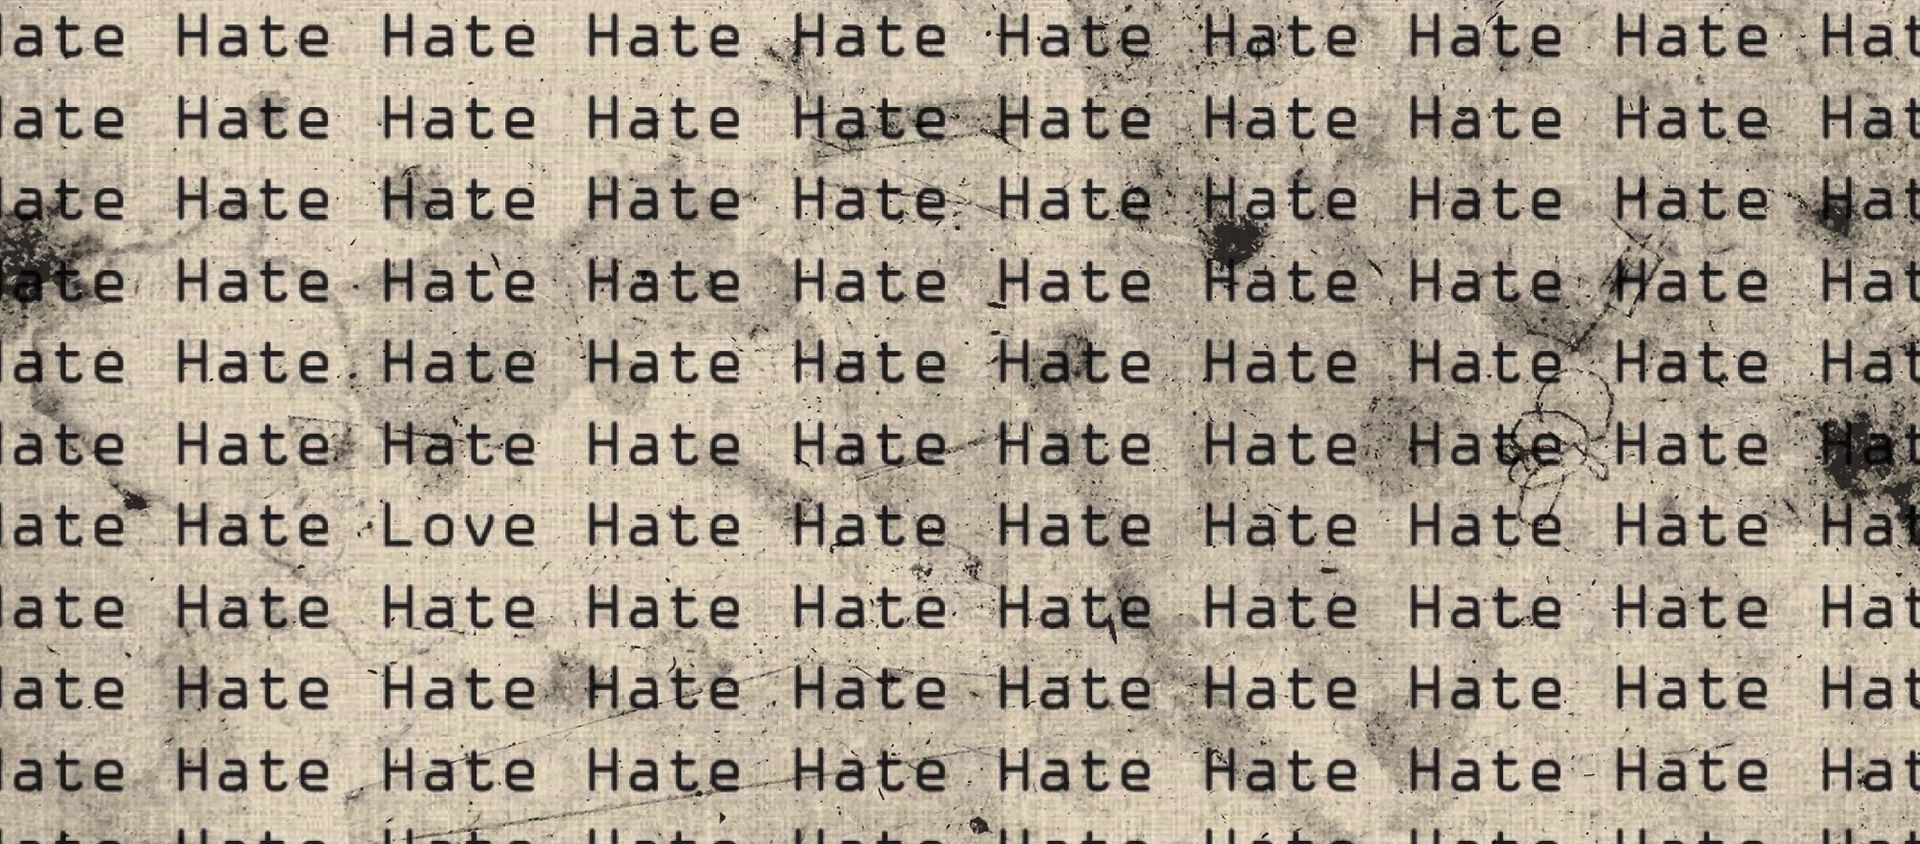 Etnička mržnja je zarazna